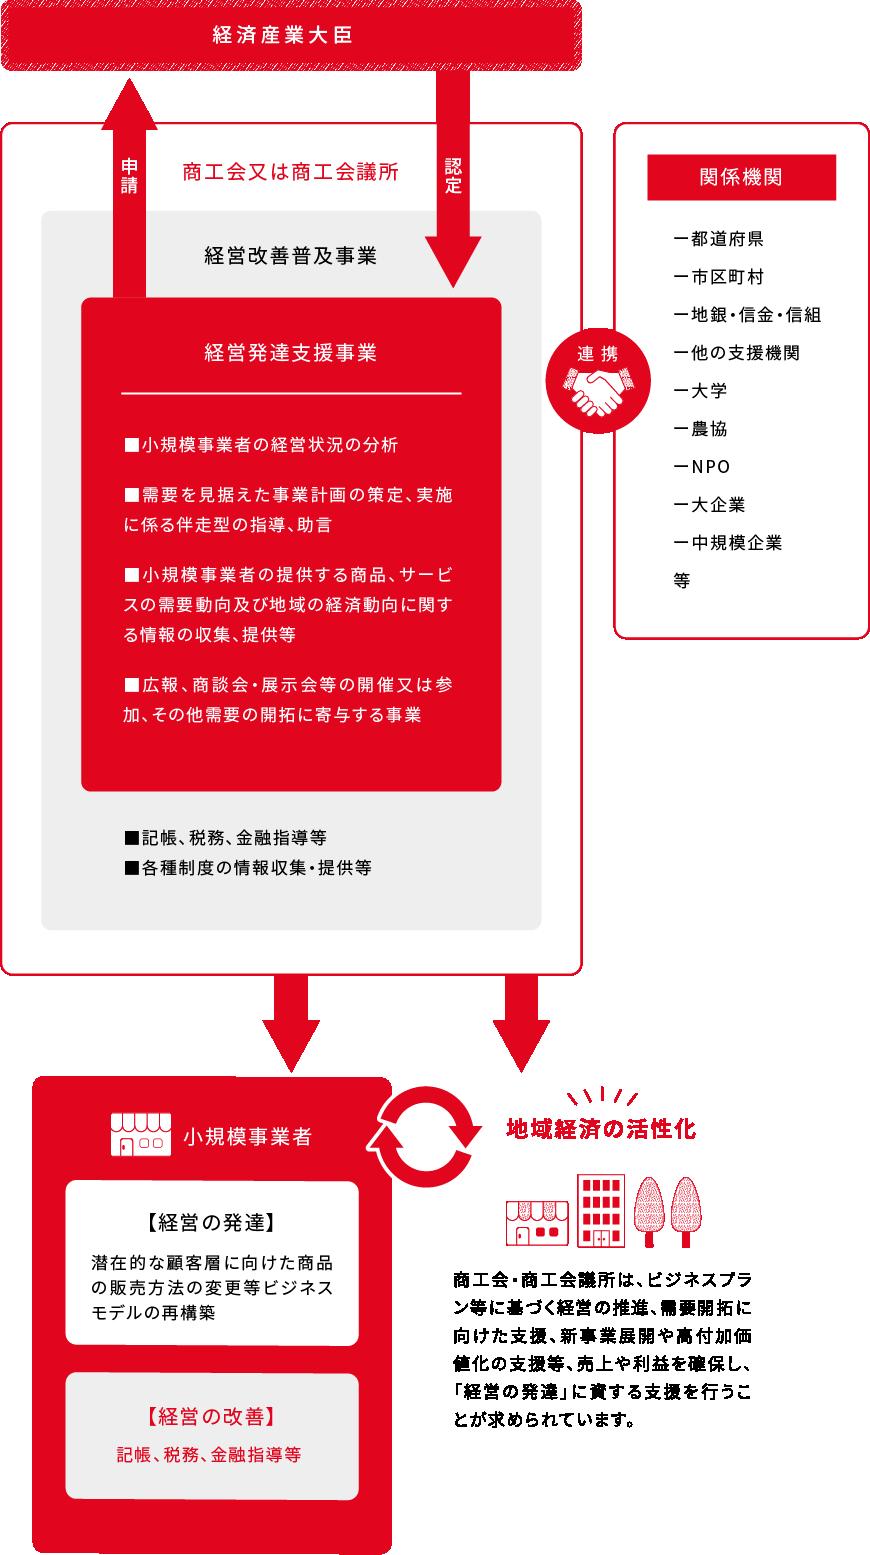 経営発達支援計画支援イメージ